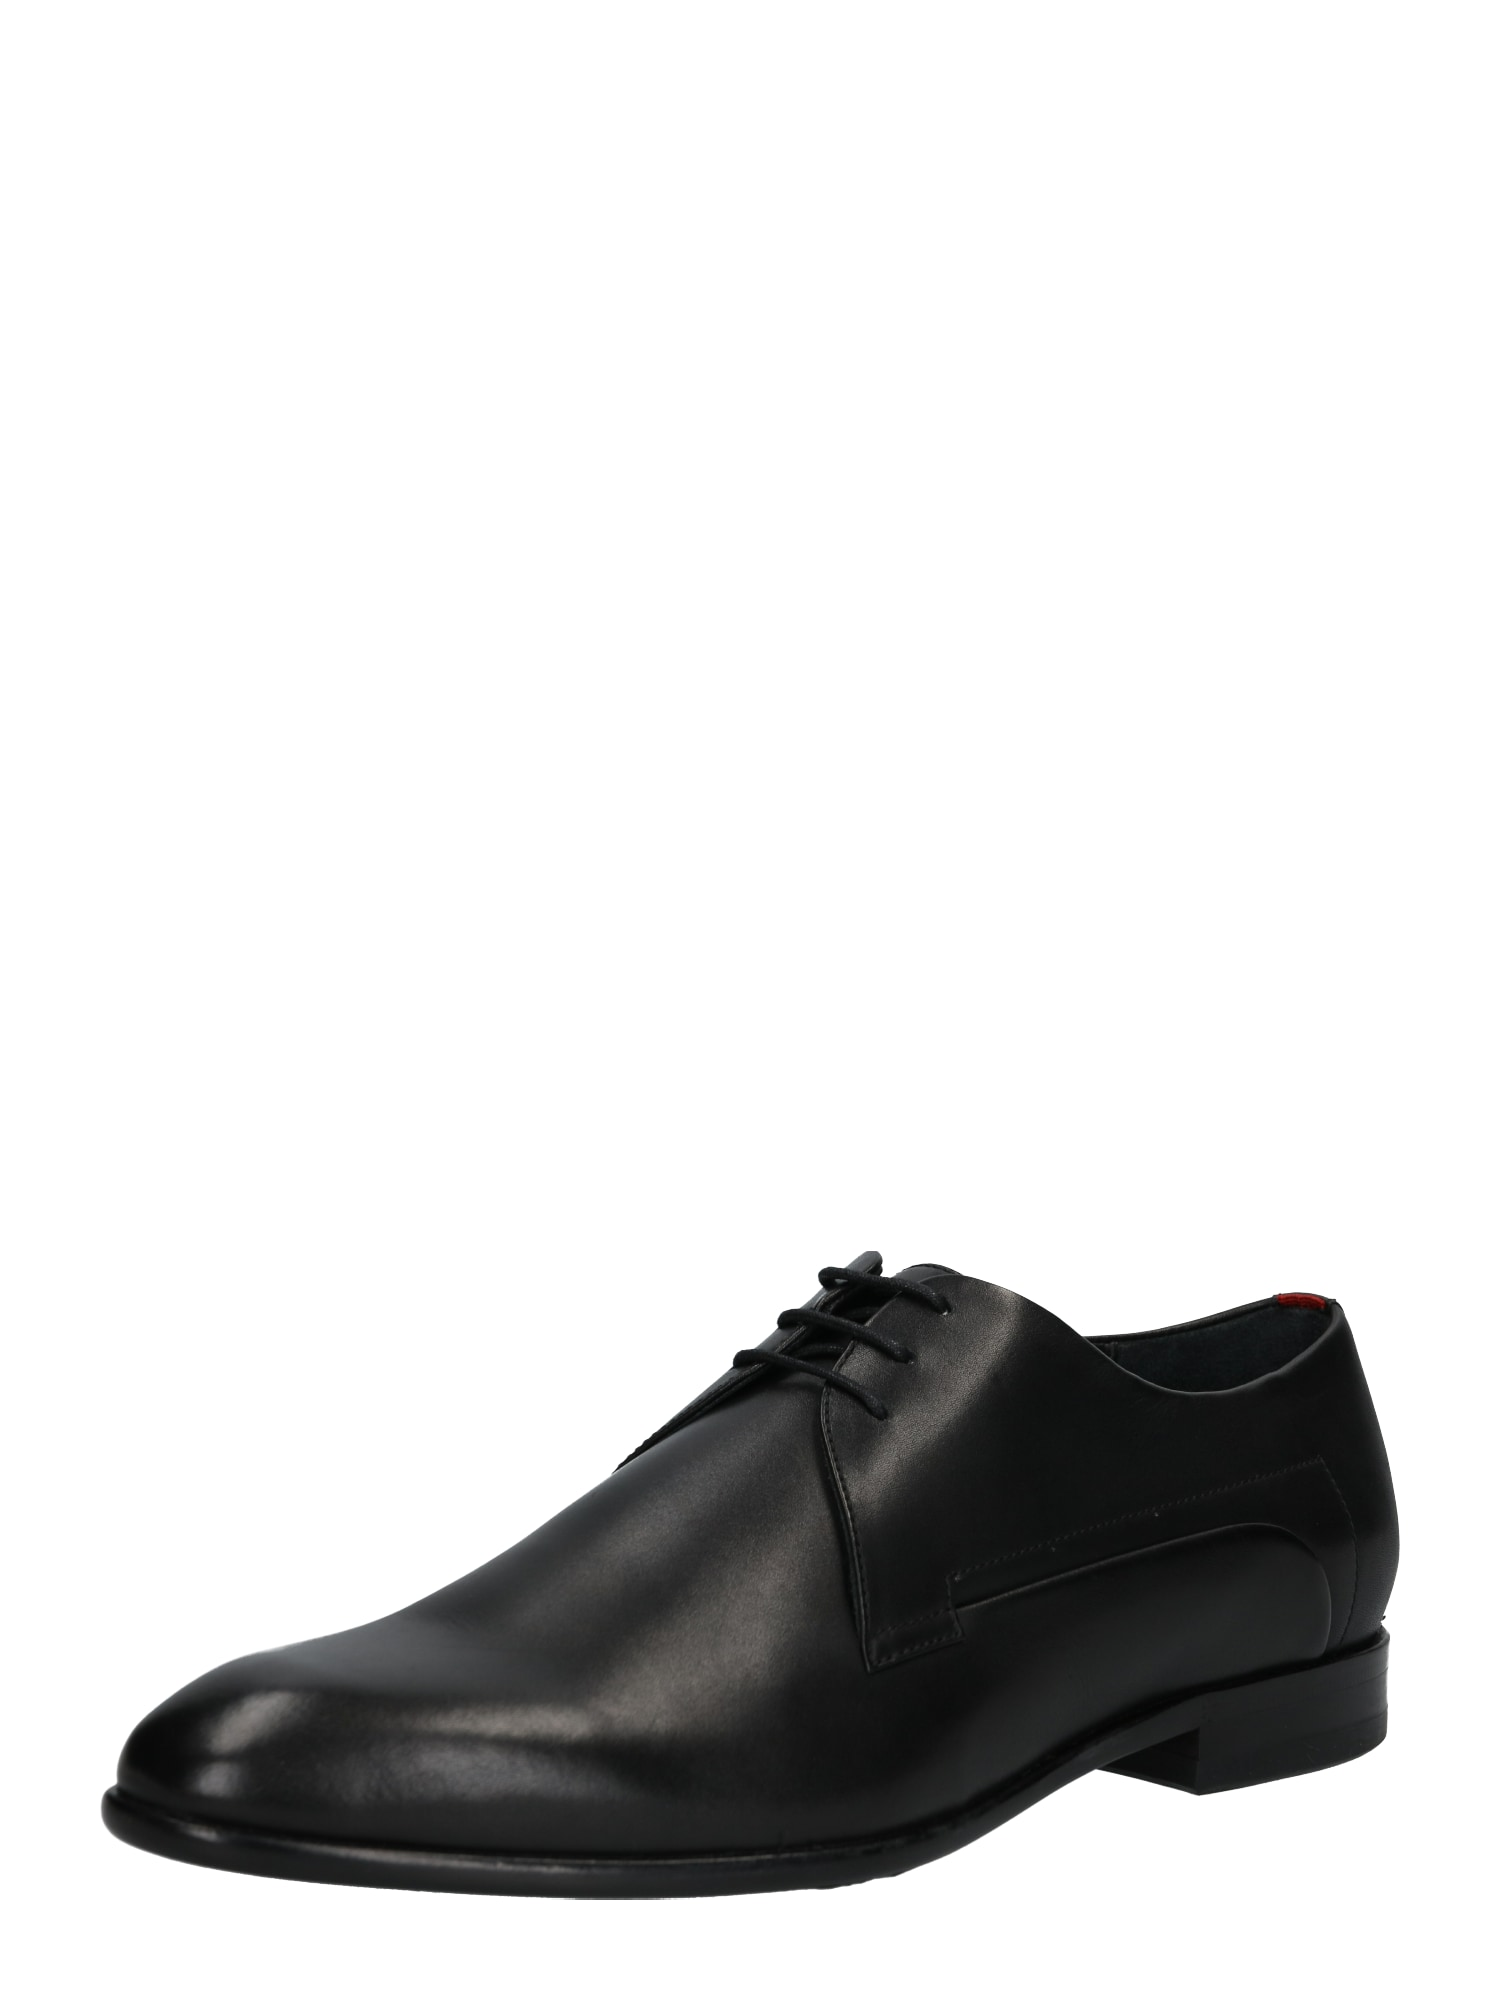 Šněrovací boty APPEAL_DERB_LT černá HUGO